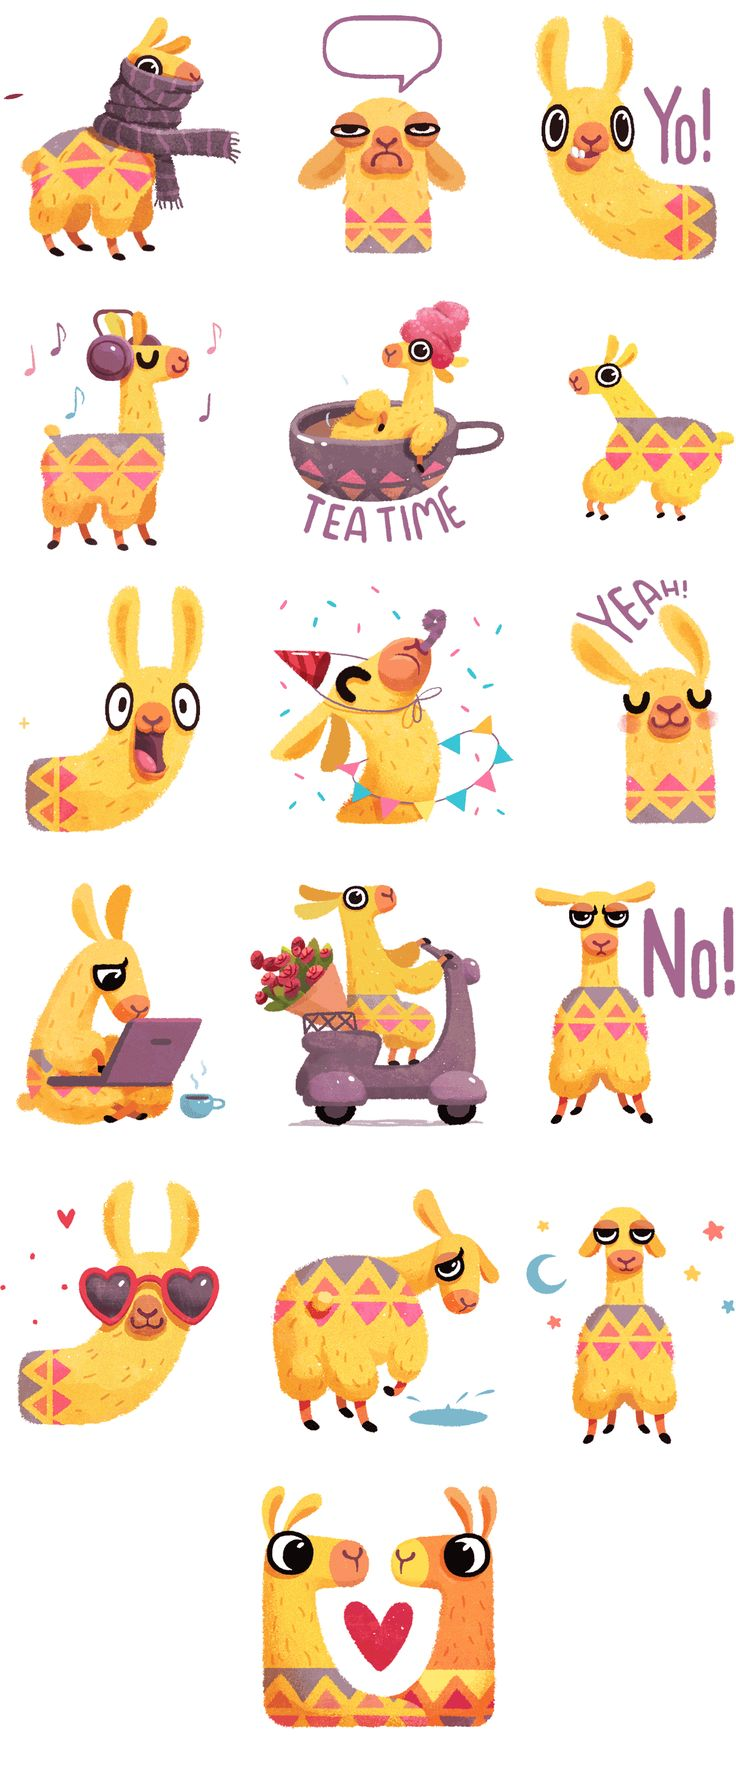 Hipster Llama iOS10 Sticker Pack on Behance